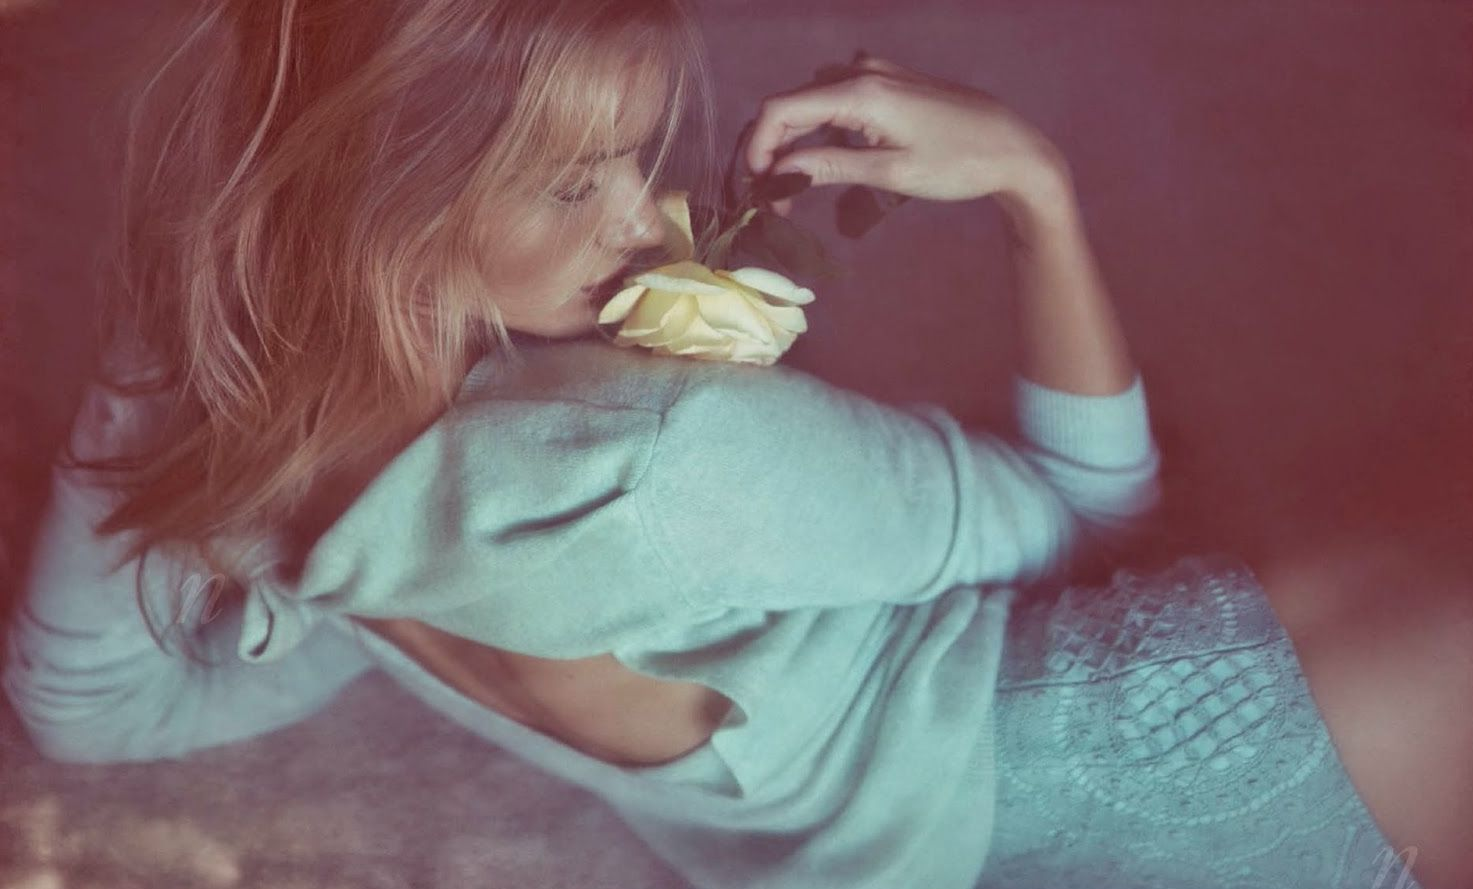 Роузи Хантингтон-Уайтли новое